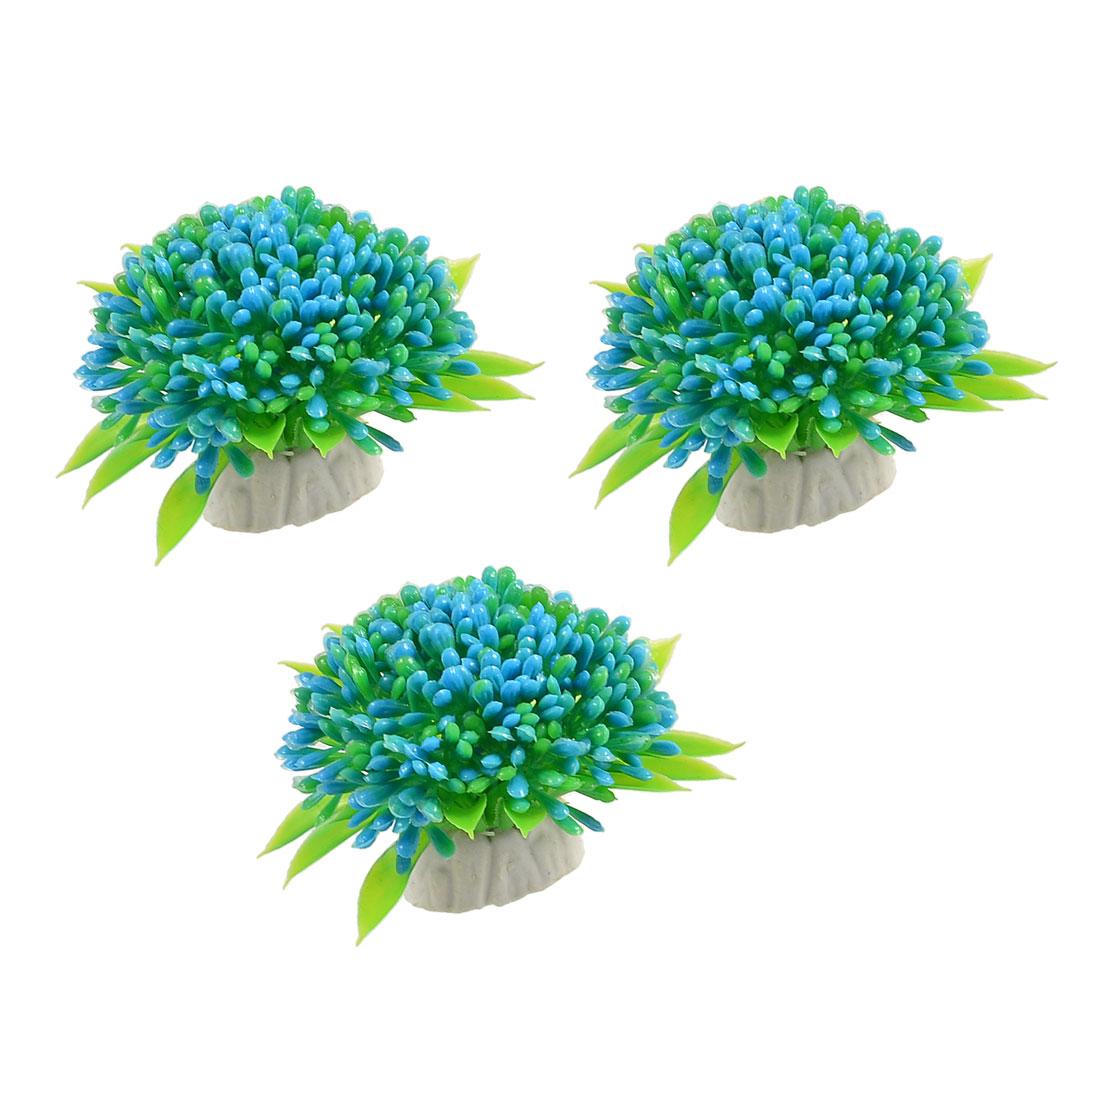 3 Pcs Green Blue Lifelike Aquarium Plastic Plant Flower Decoration